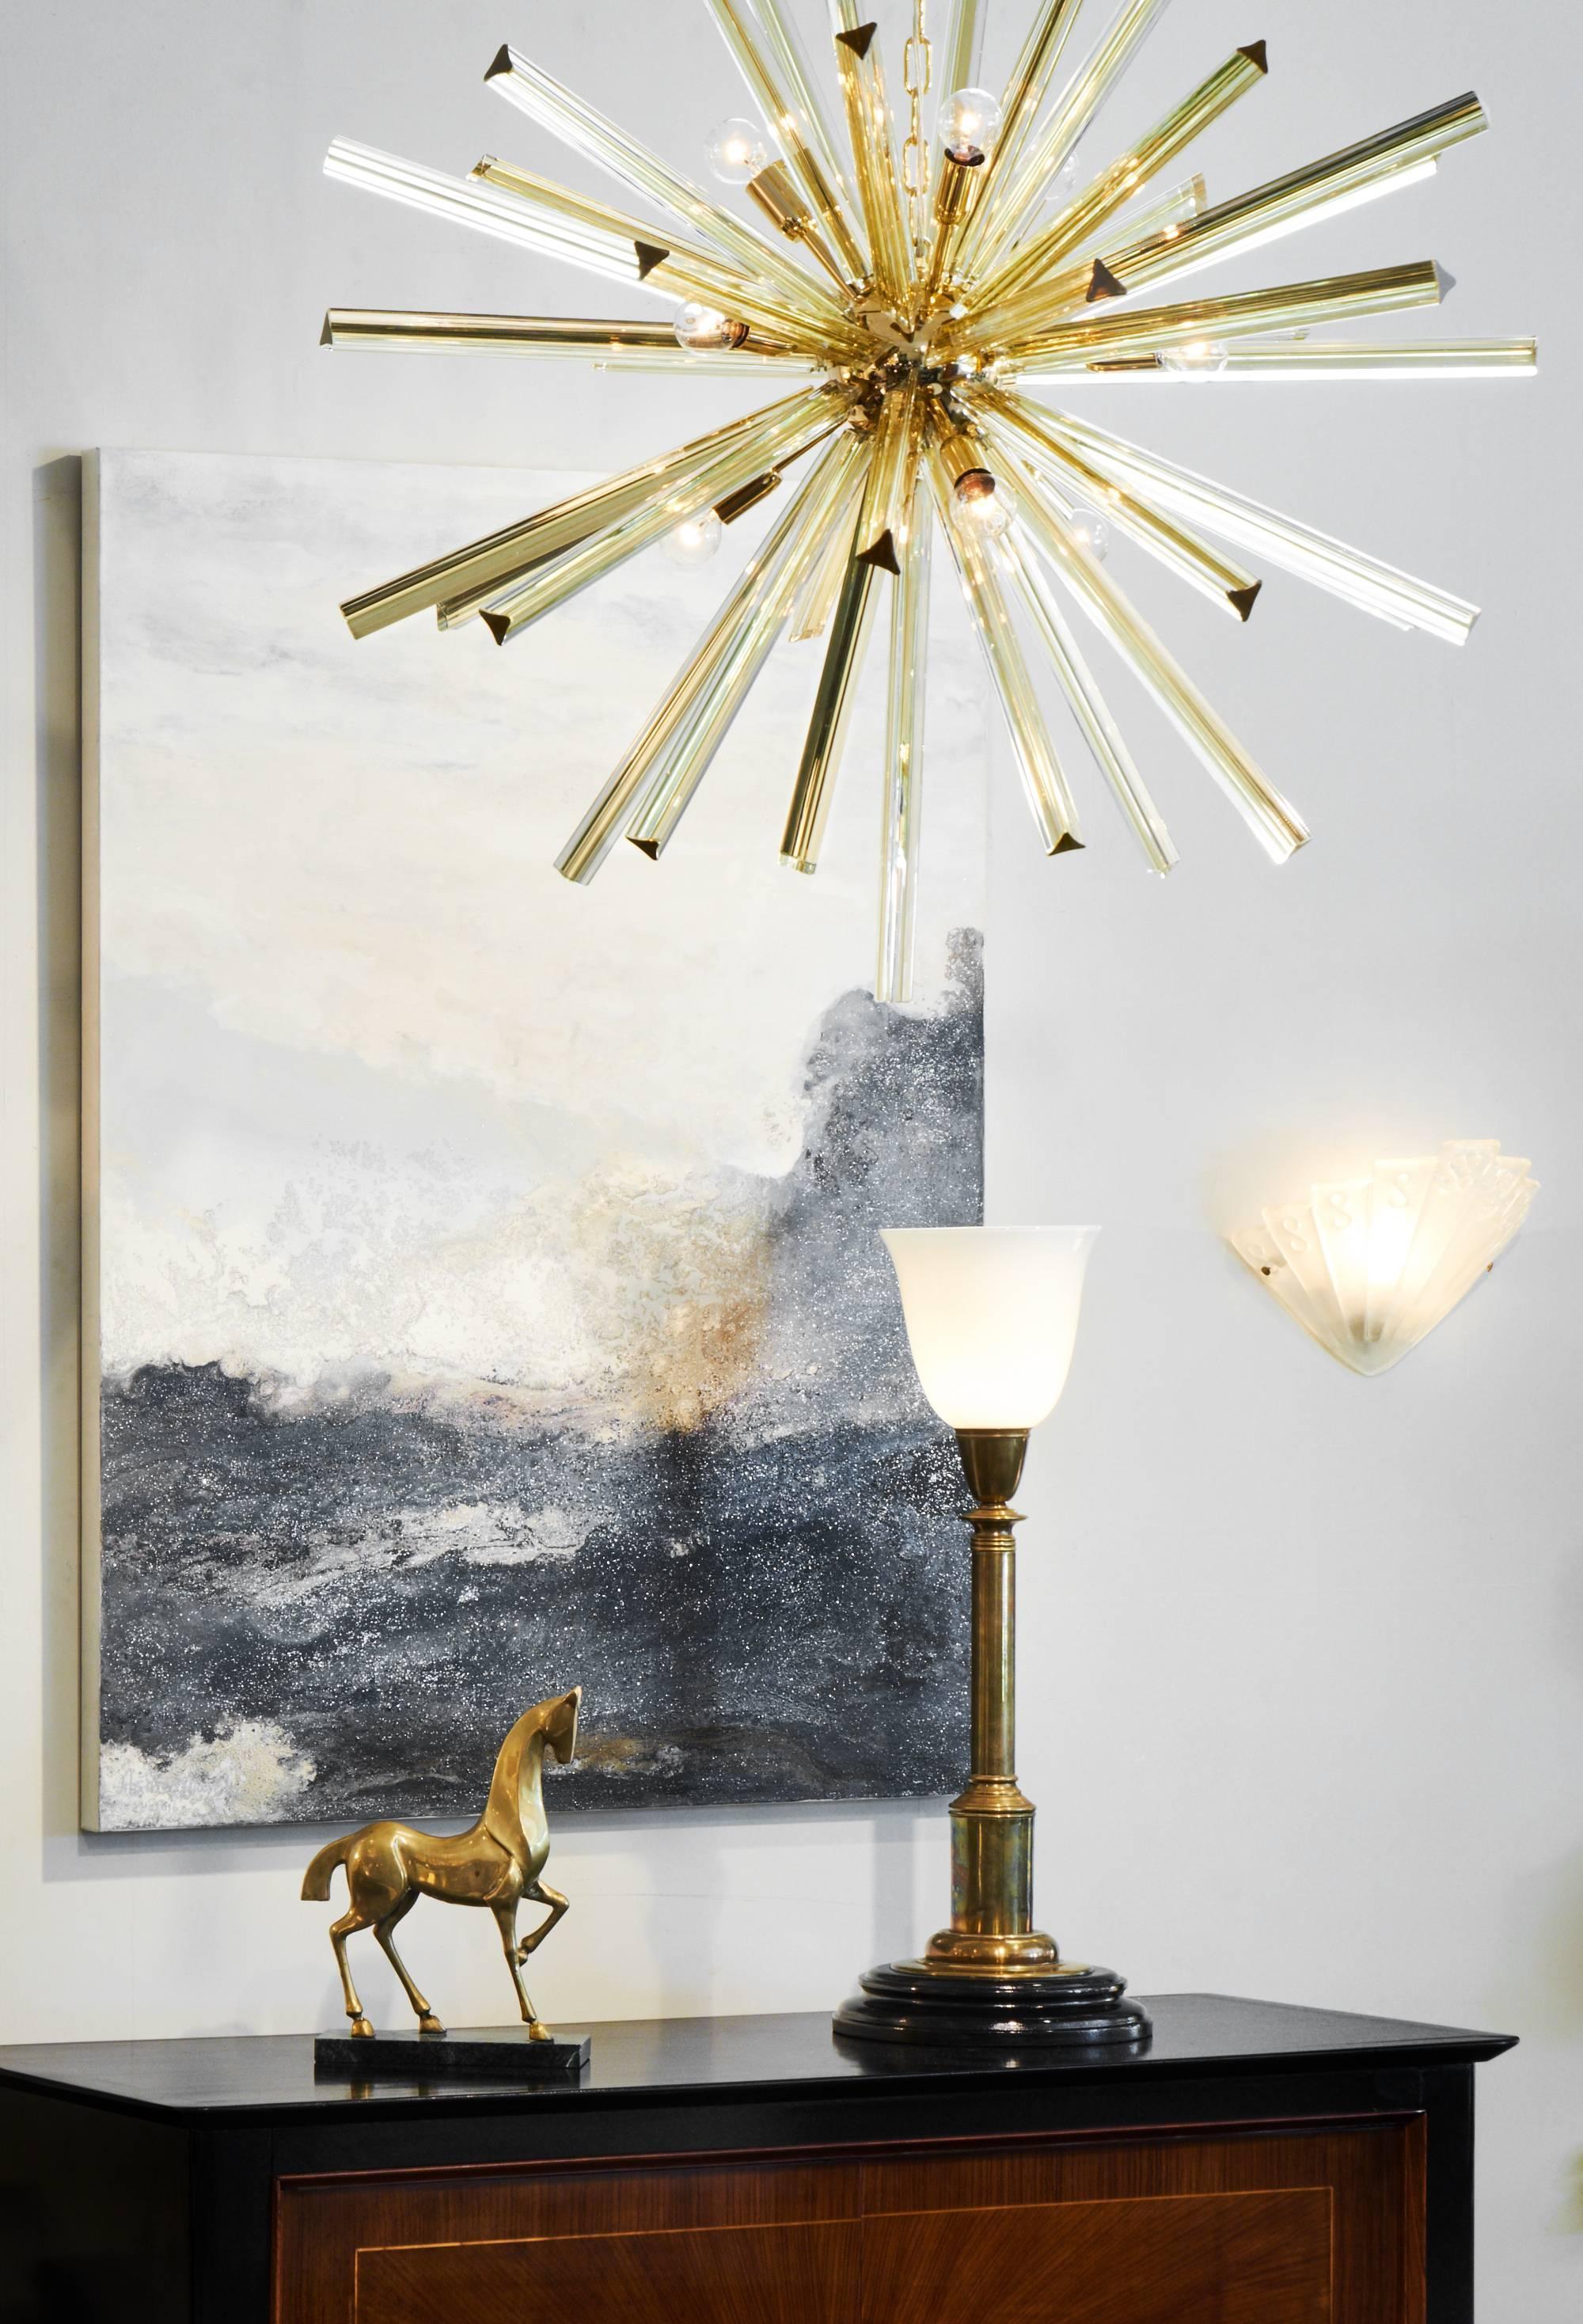 design sputnik brucie wayfair light lighting urchin trent pdx austin chandelier